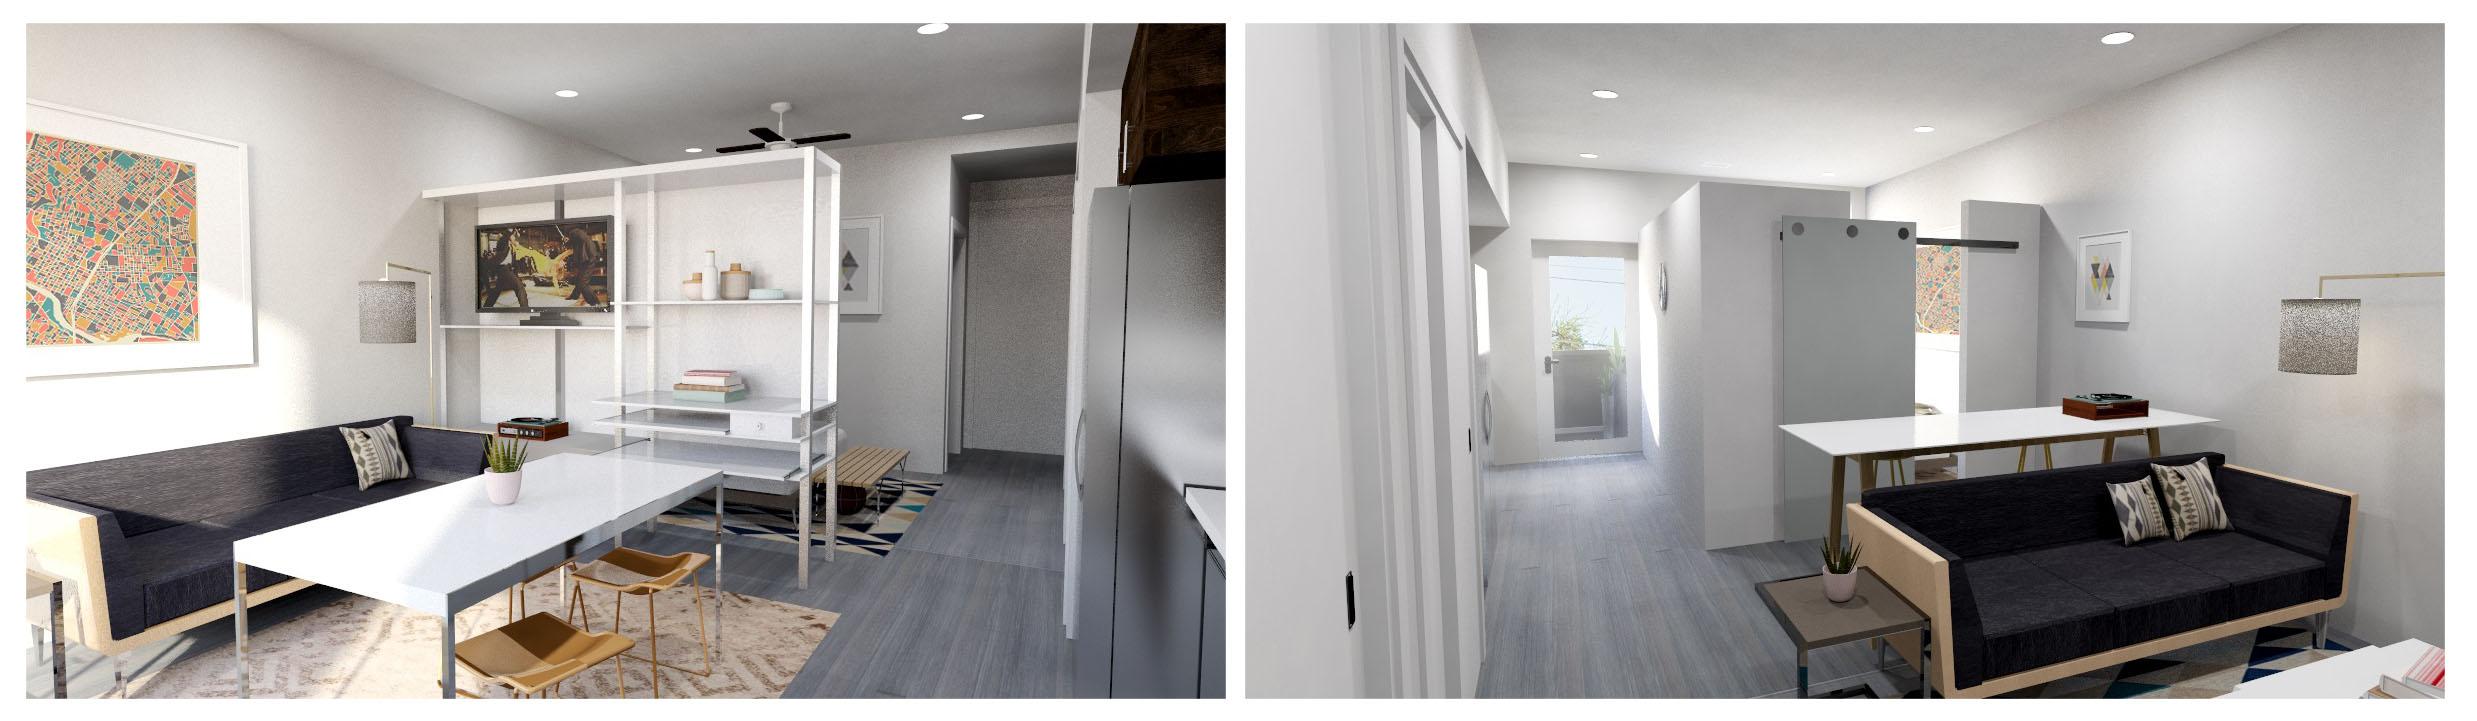 interior units 2.jpg